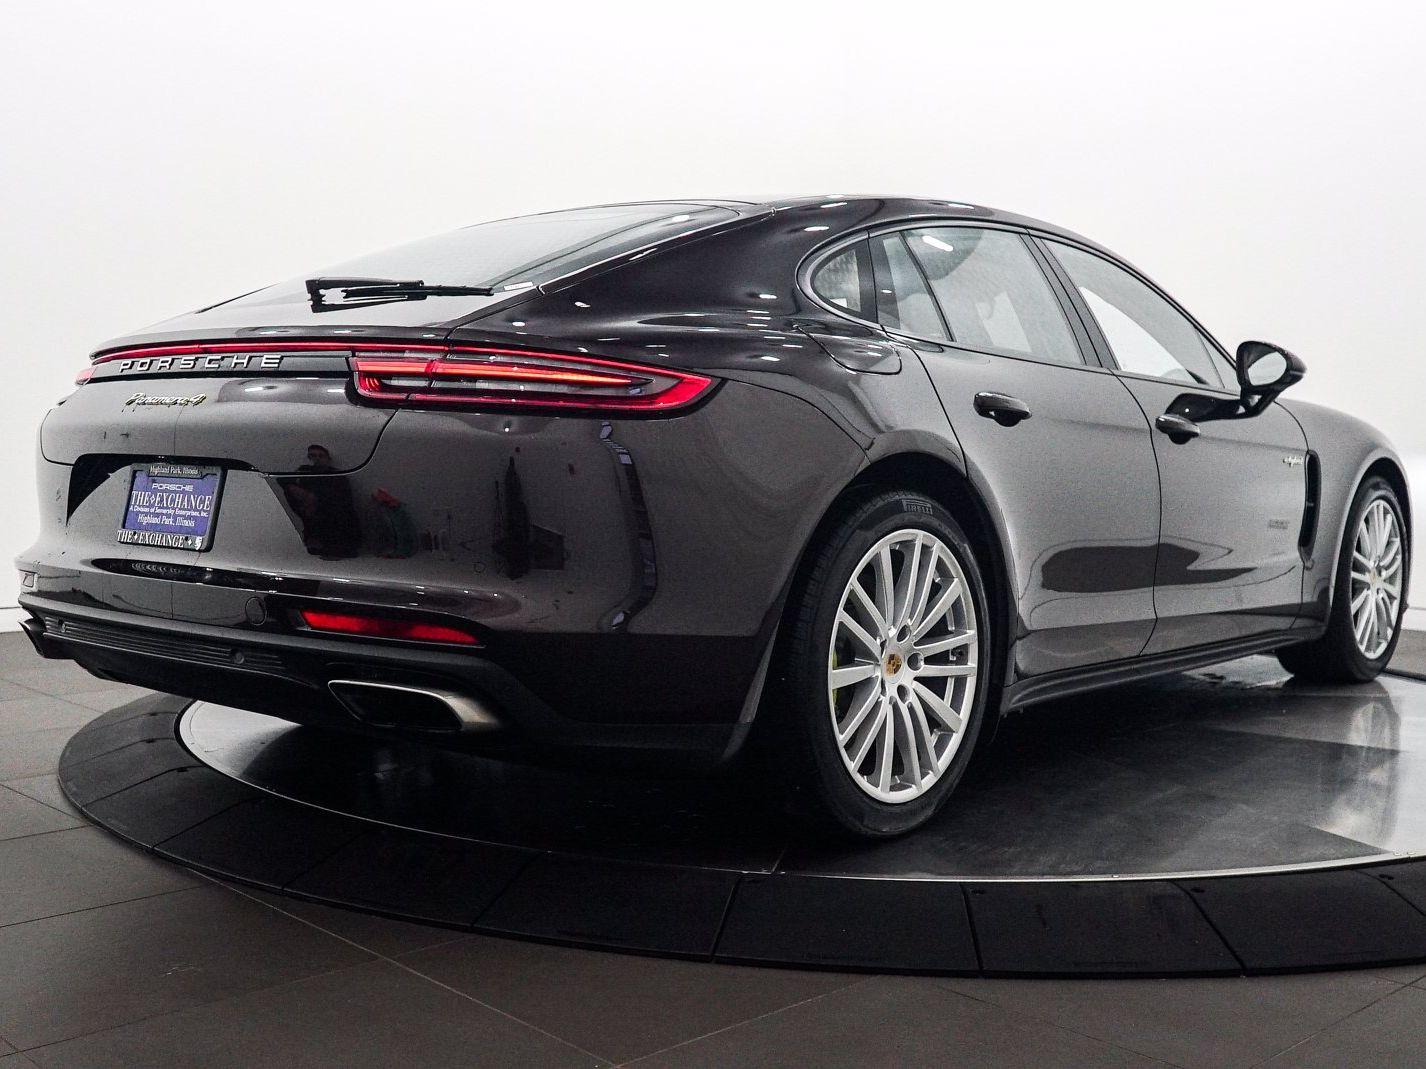 2018 Porsche Panamera 4 E-Hybrid – 4